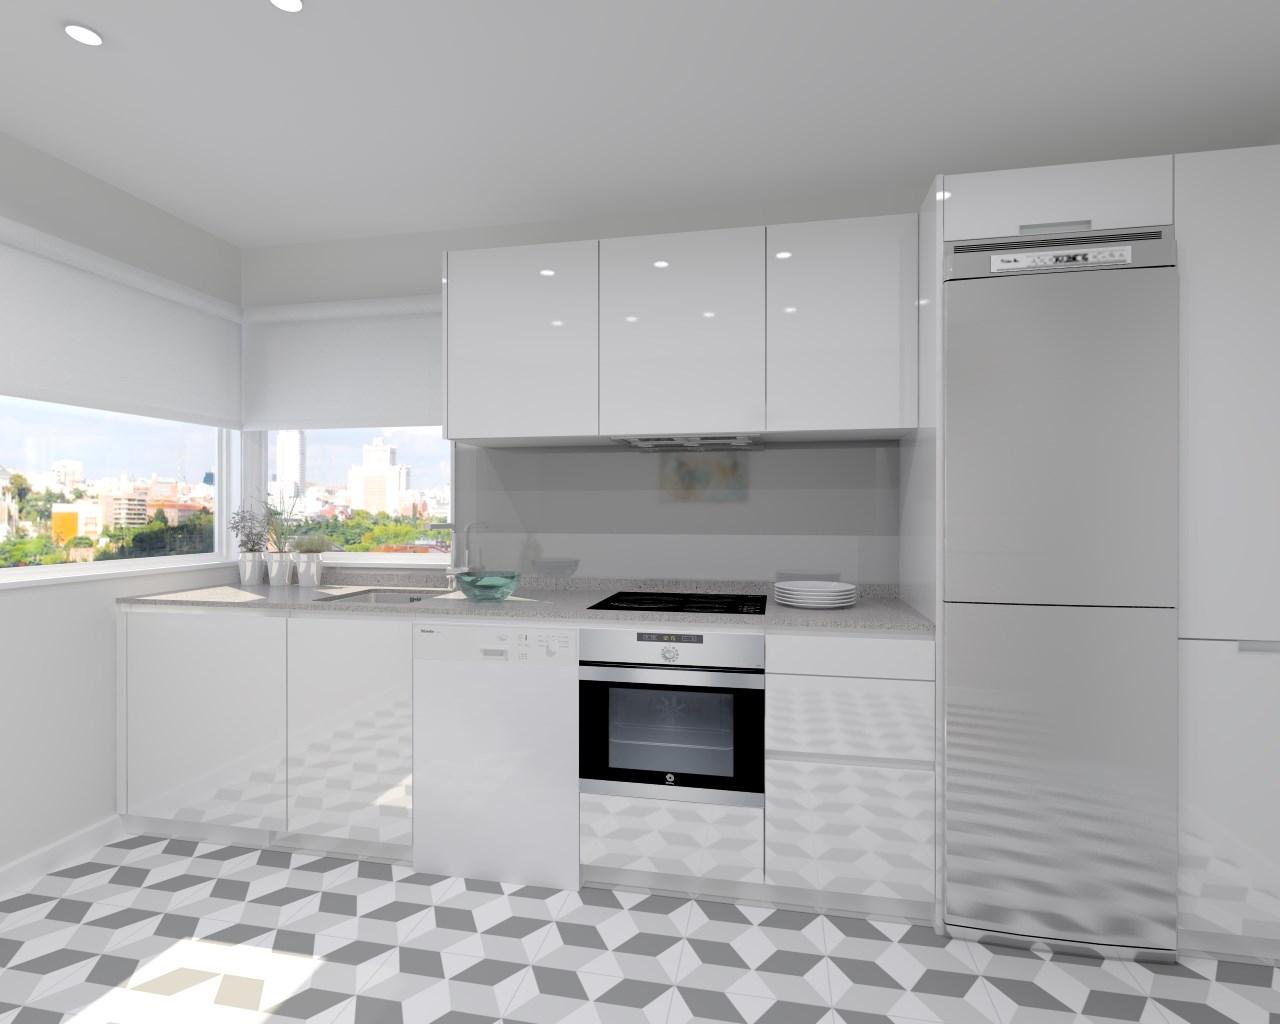 Cocina santos modelo line laminado blanco brillo encimera for Modelo de cocina 2016